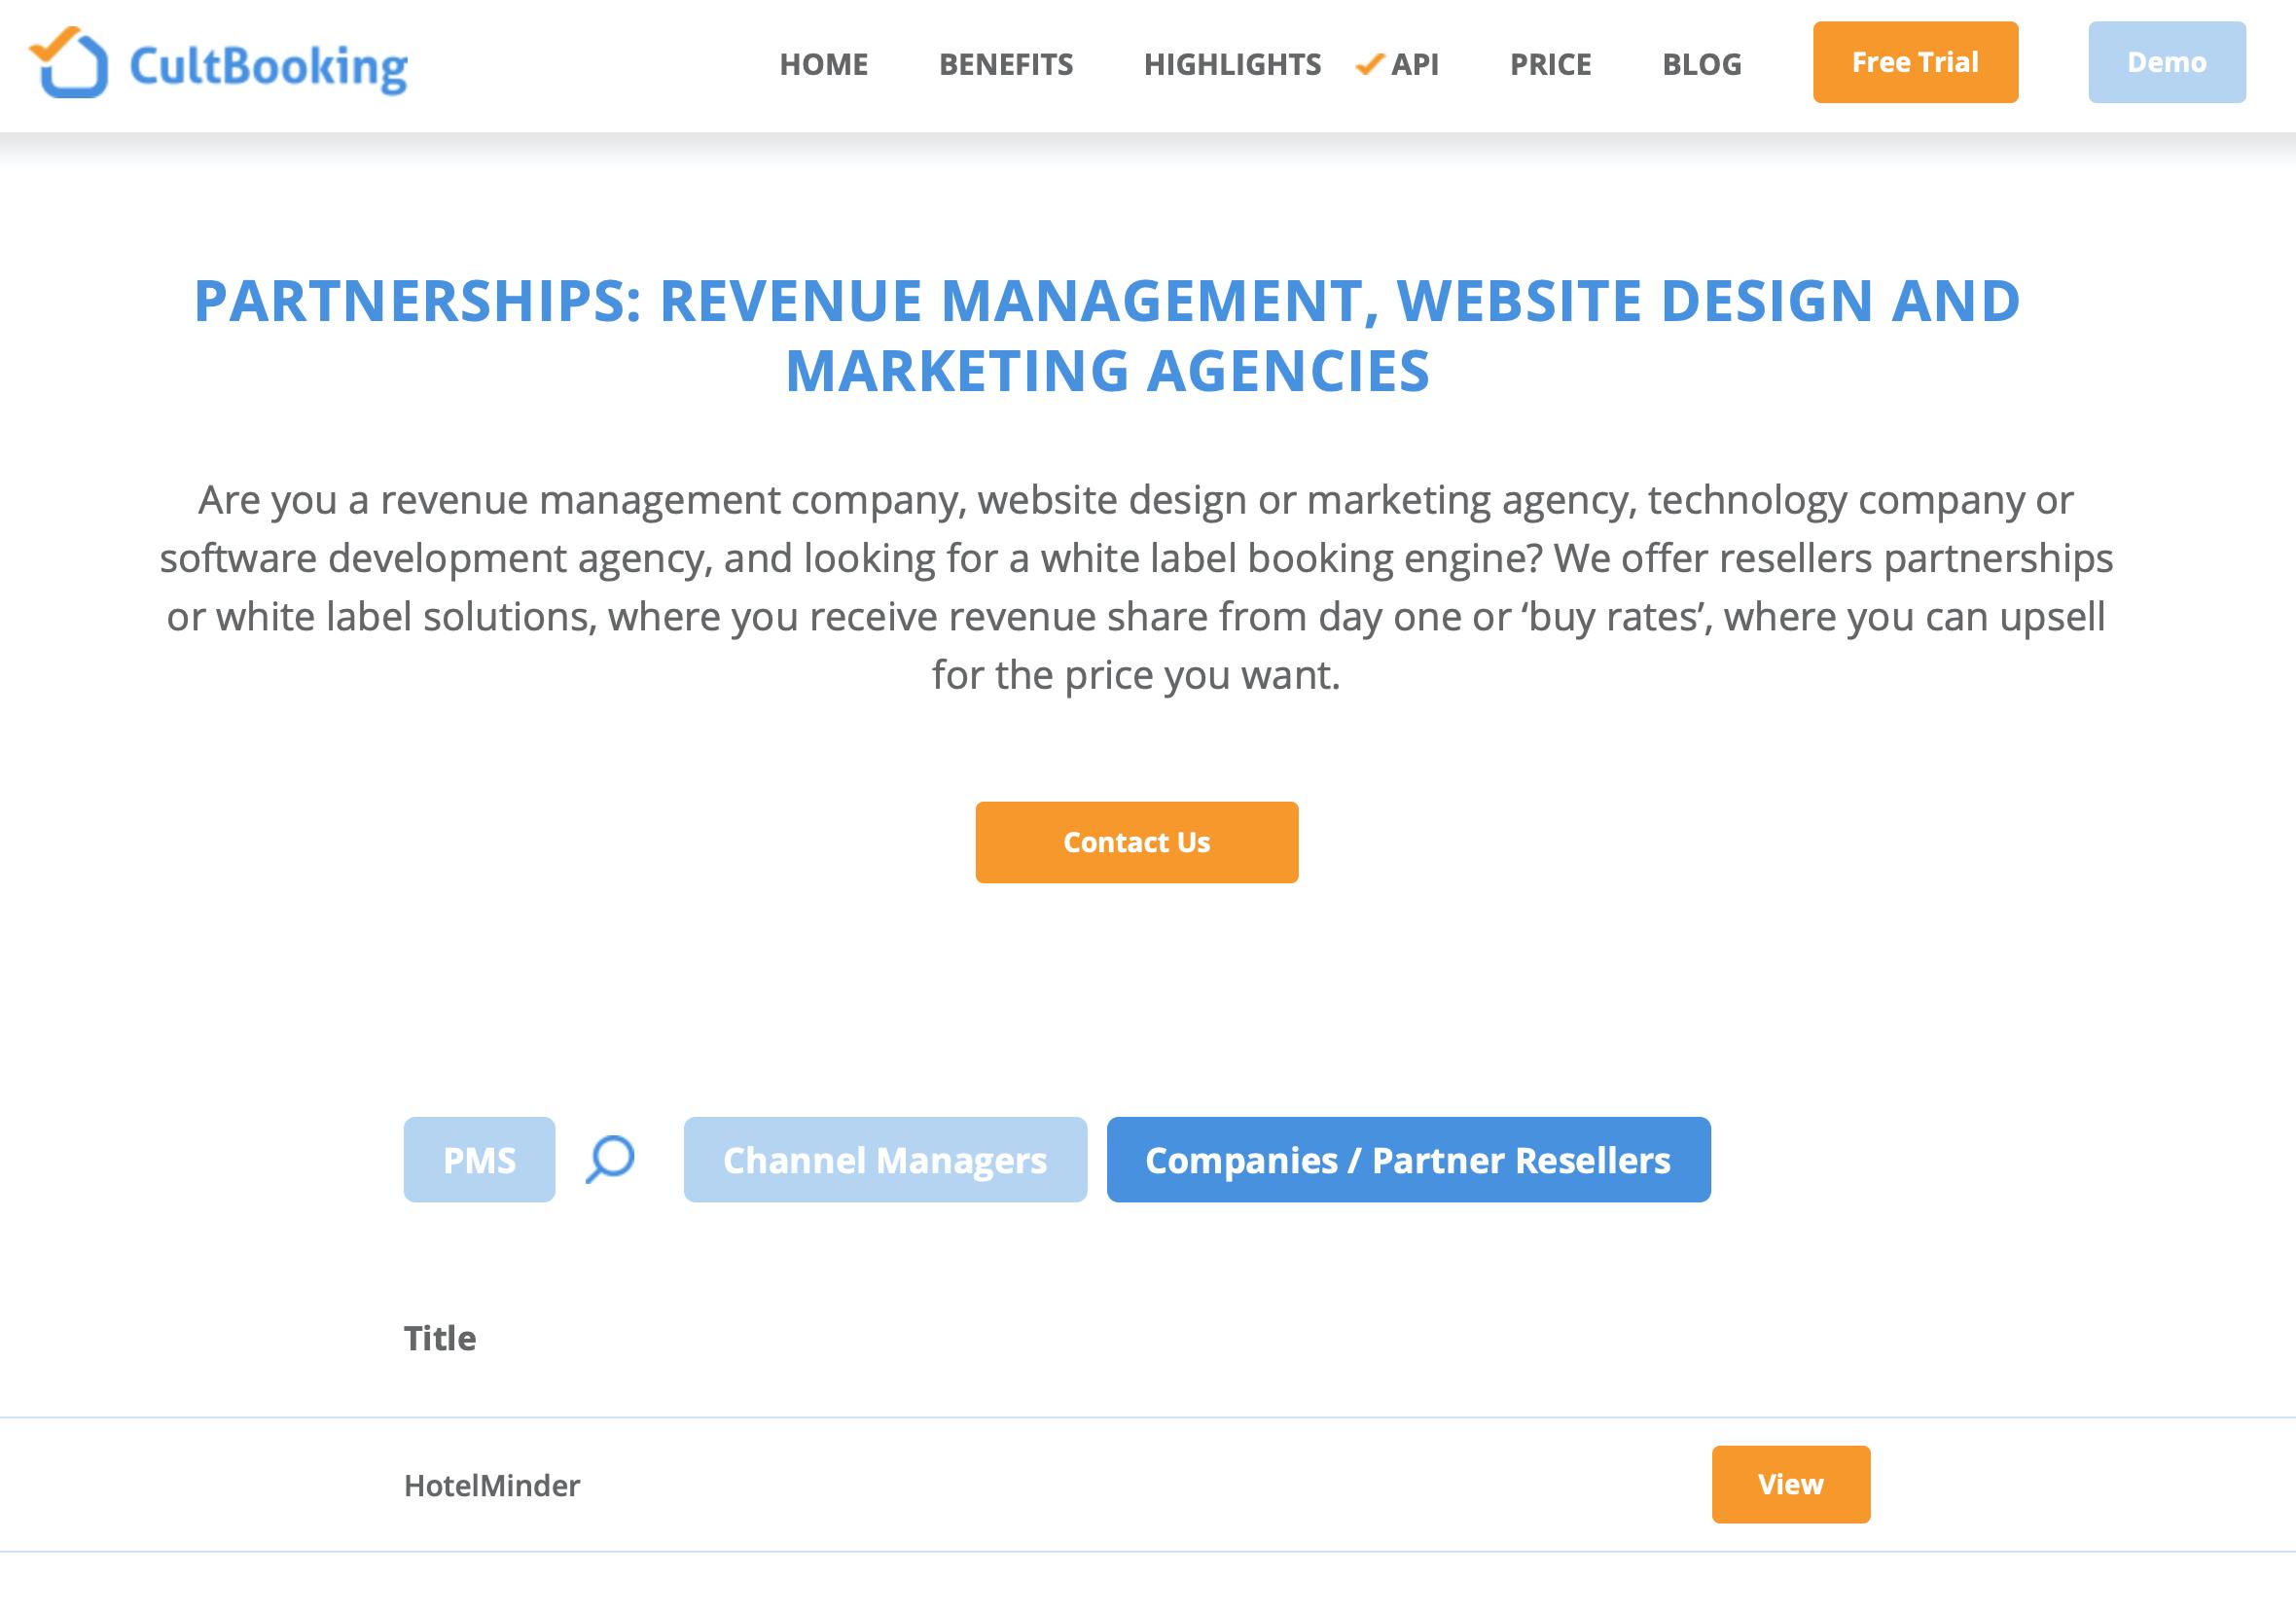 hotelminder on cultbooking website marketing agency partnership - partner